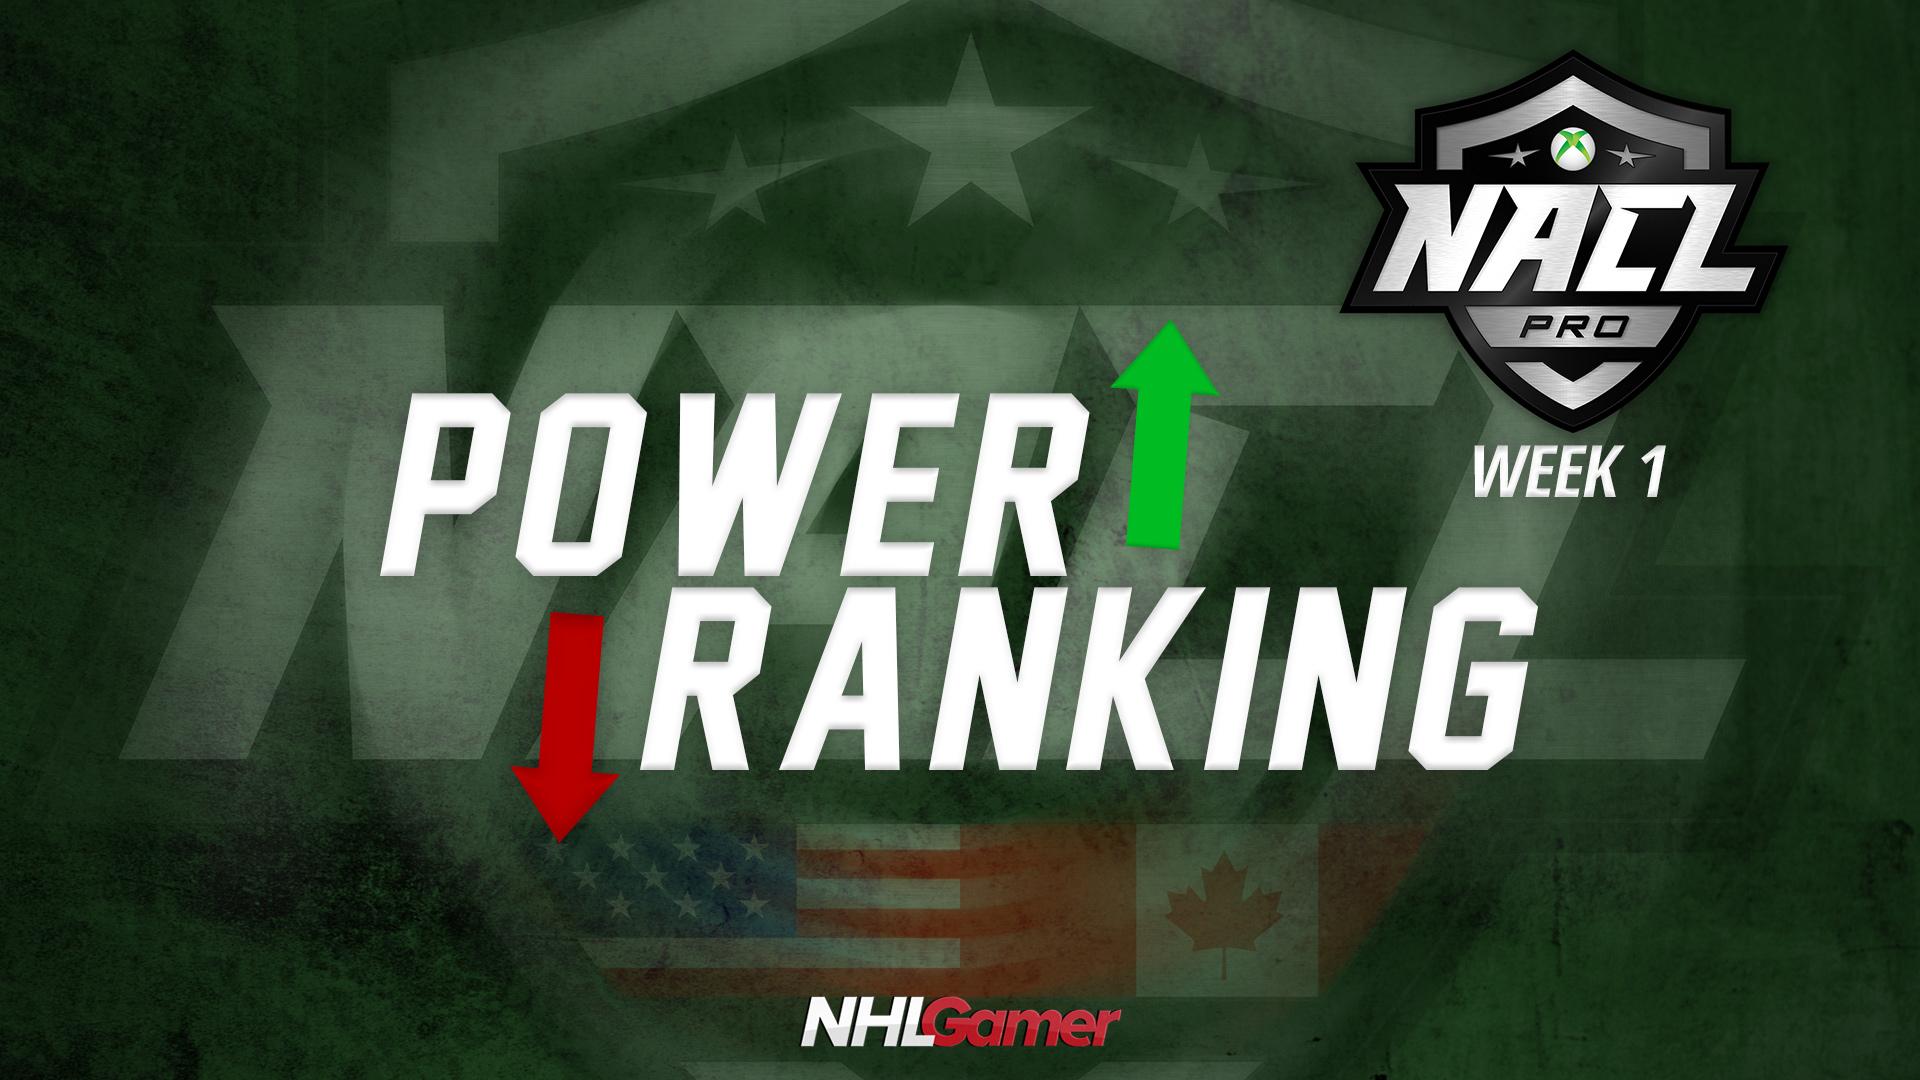 Xbox_NACL_Pro_Power_Ranking_Week_1.jpg